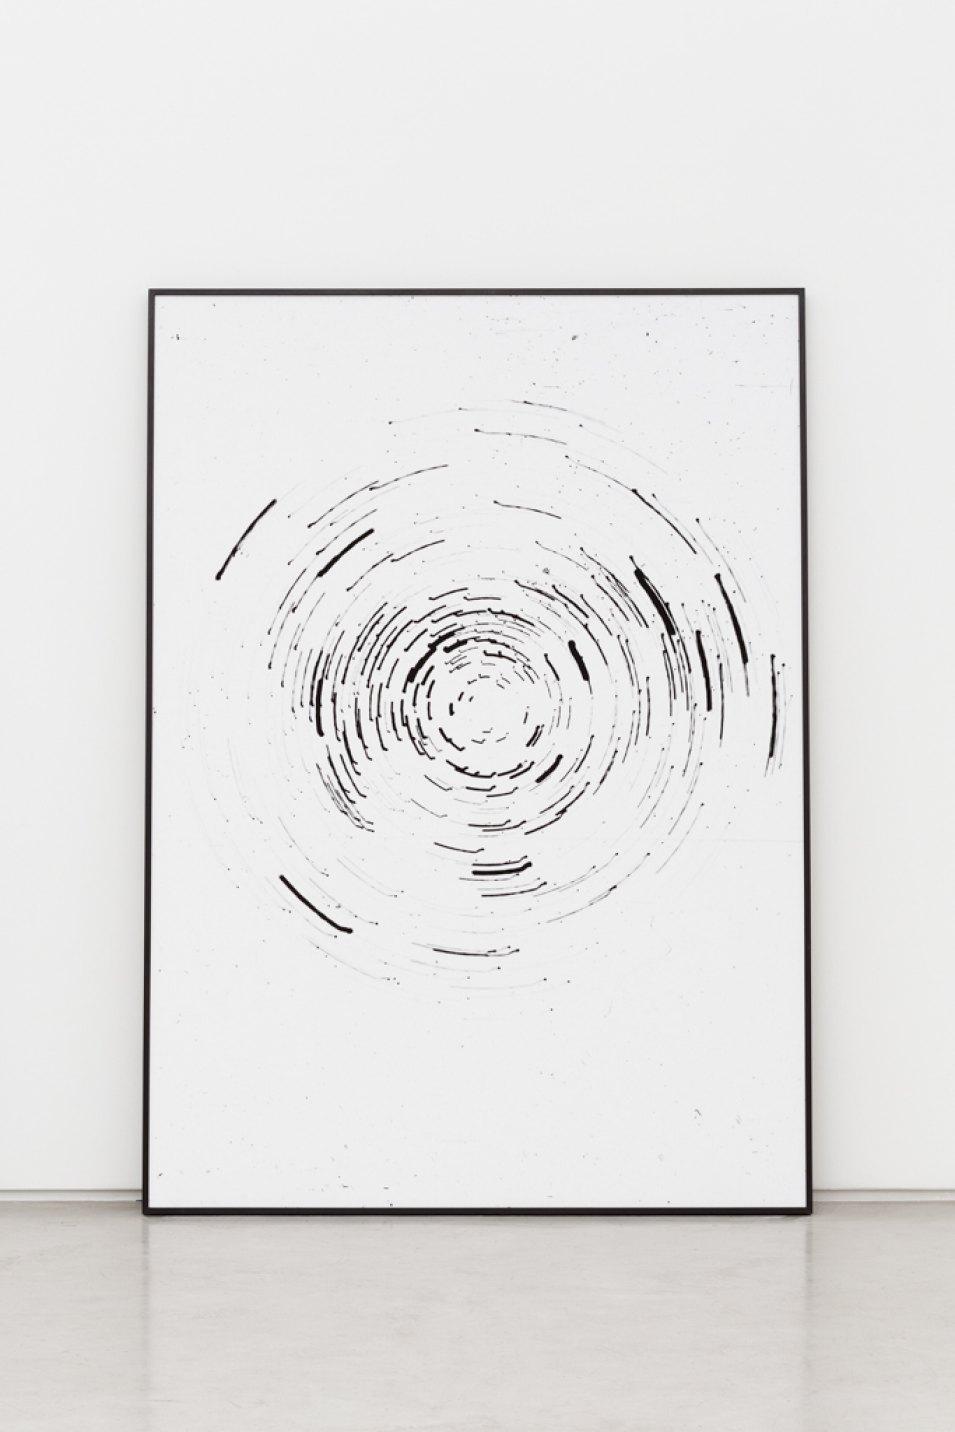 Leticia Ramos,&nbsp;<em>Planisphere</em>,&nbsp;2017,&nbsp;fine art print from microfilm,&nbsp;210 × 150 cm - Mendes Wood DM